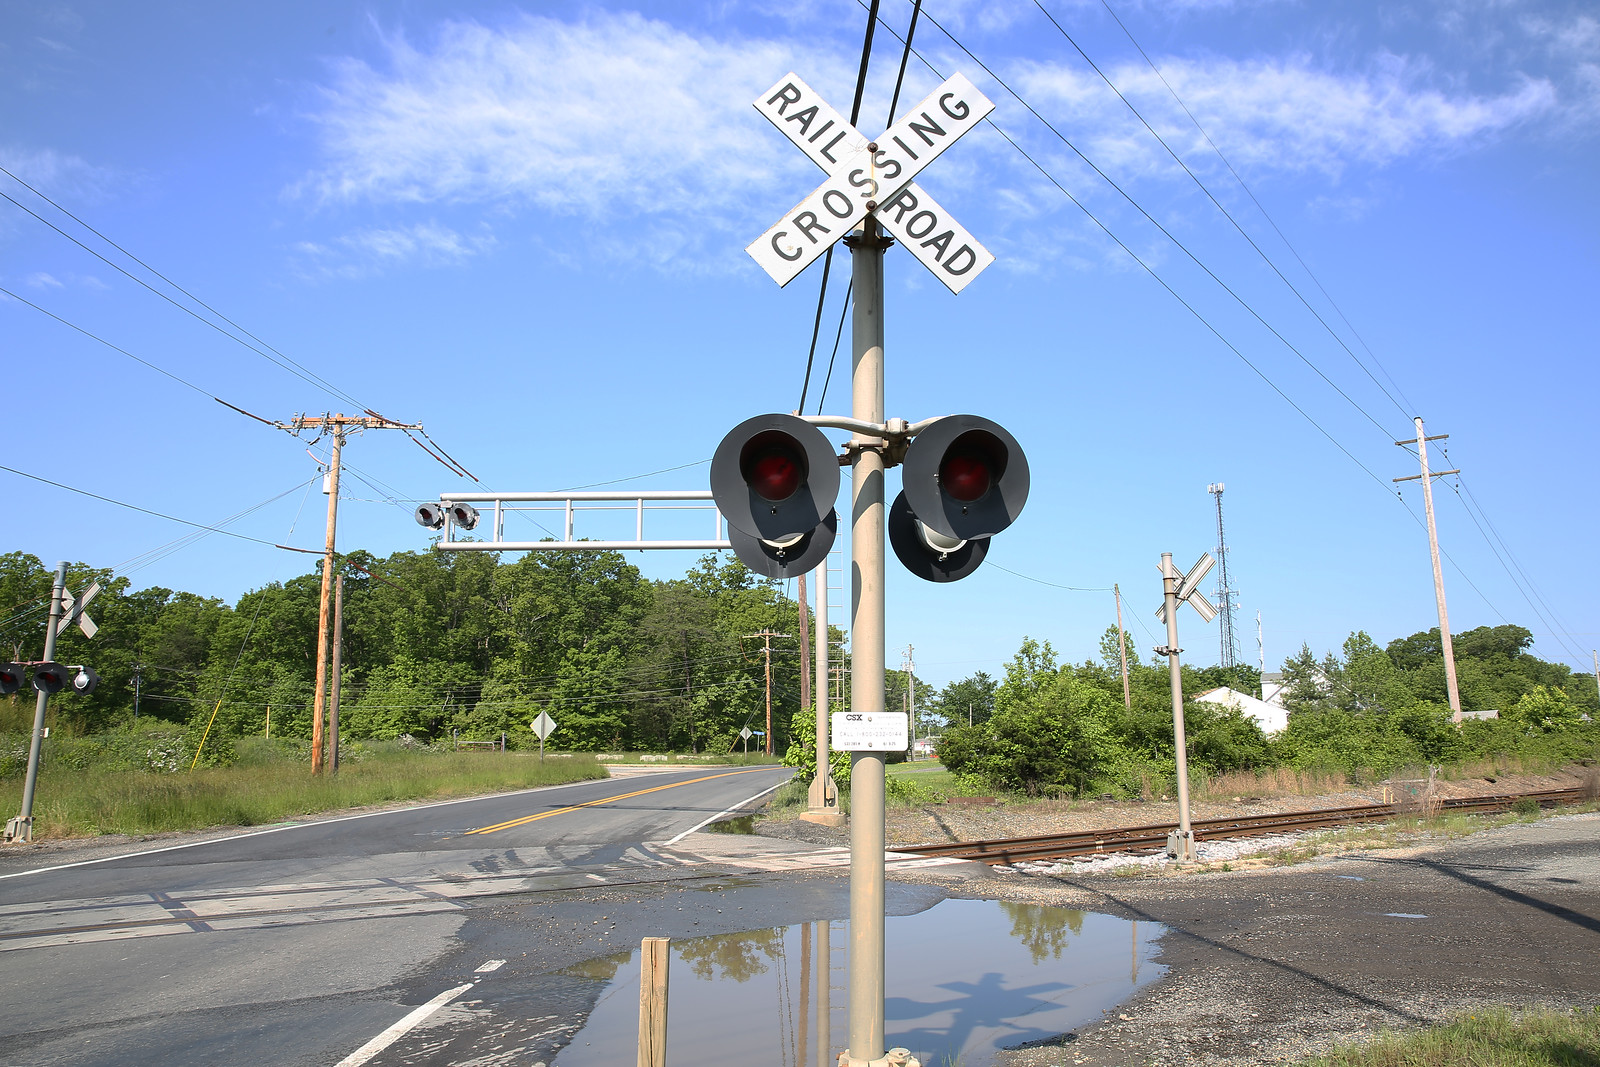 Clinton Maryland – Natural Gas Pipeline Path Contractor – Ferreira Construction